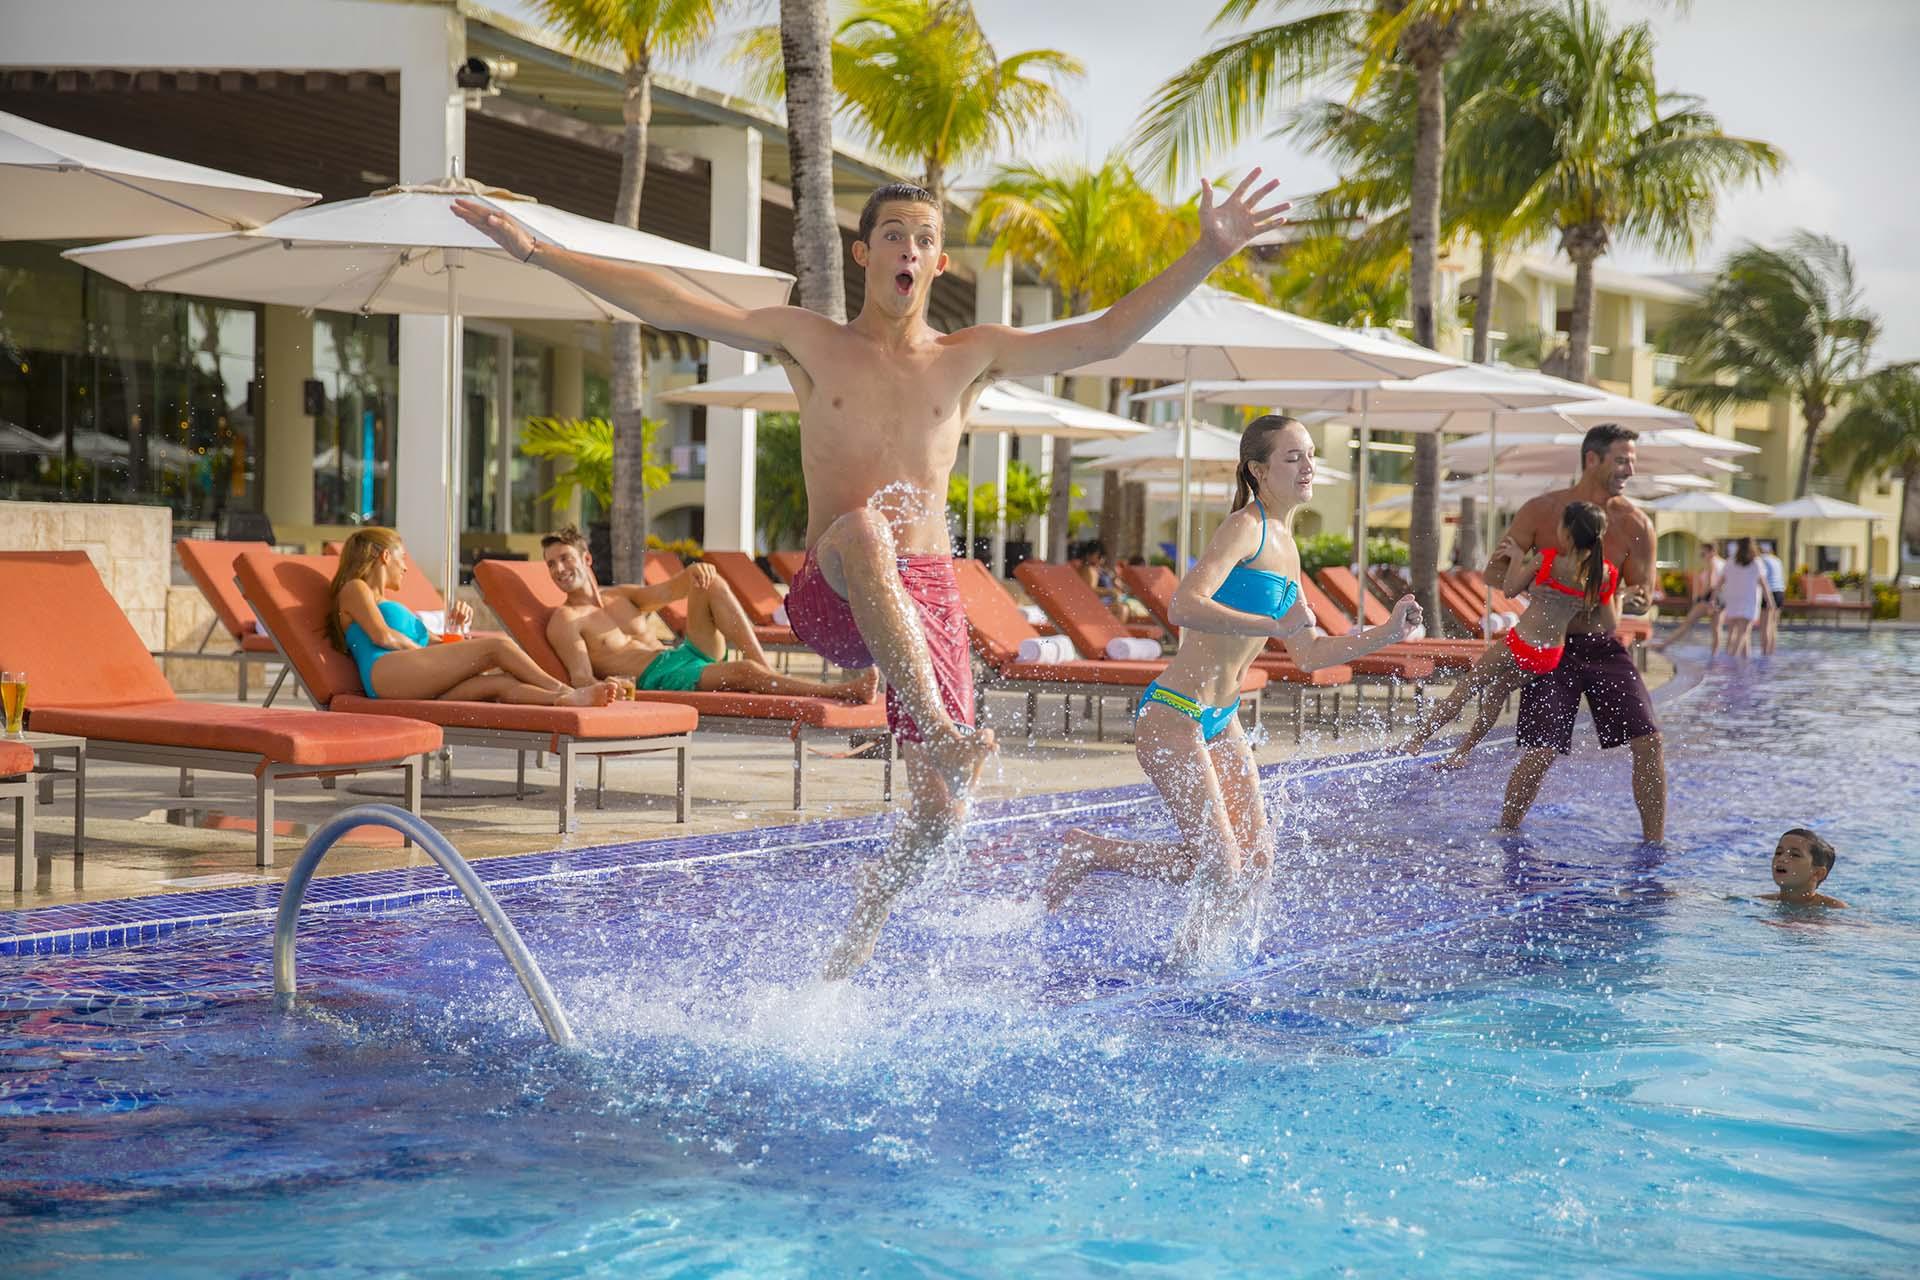 Palace Resort Promocao menor 18 anos